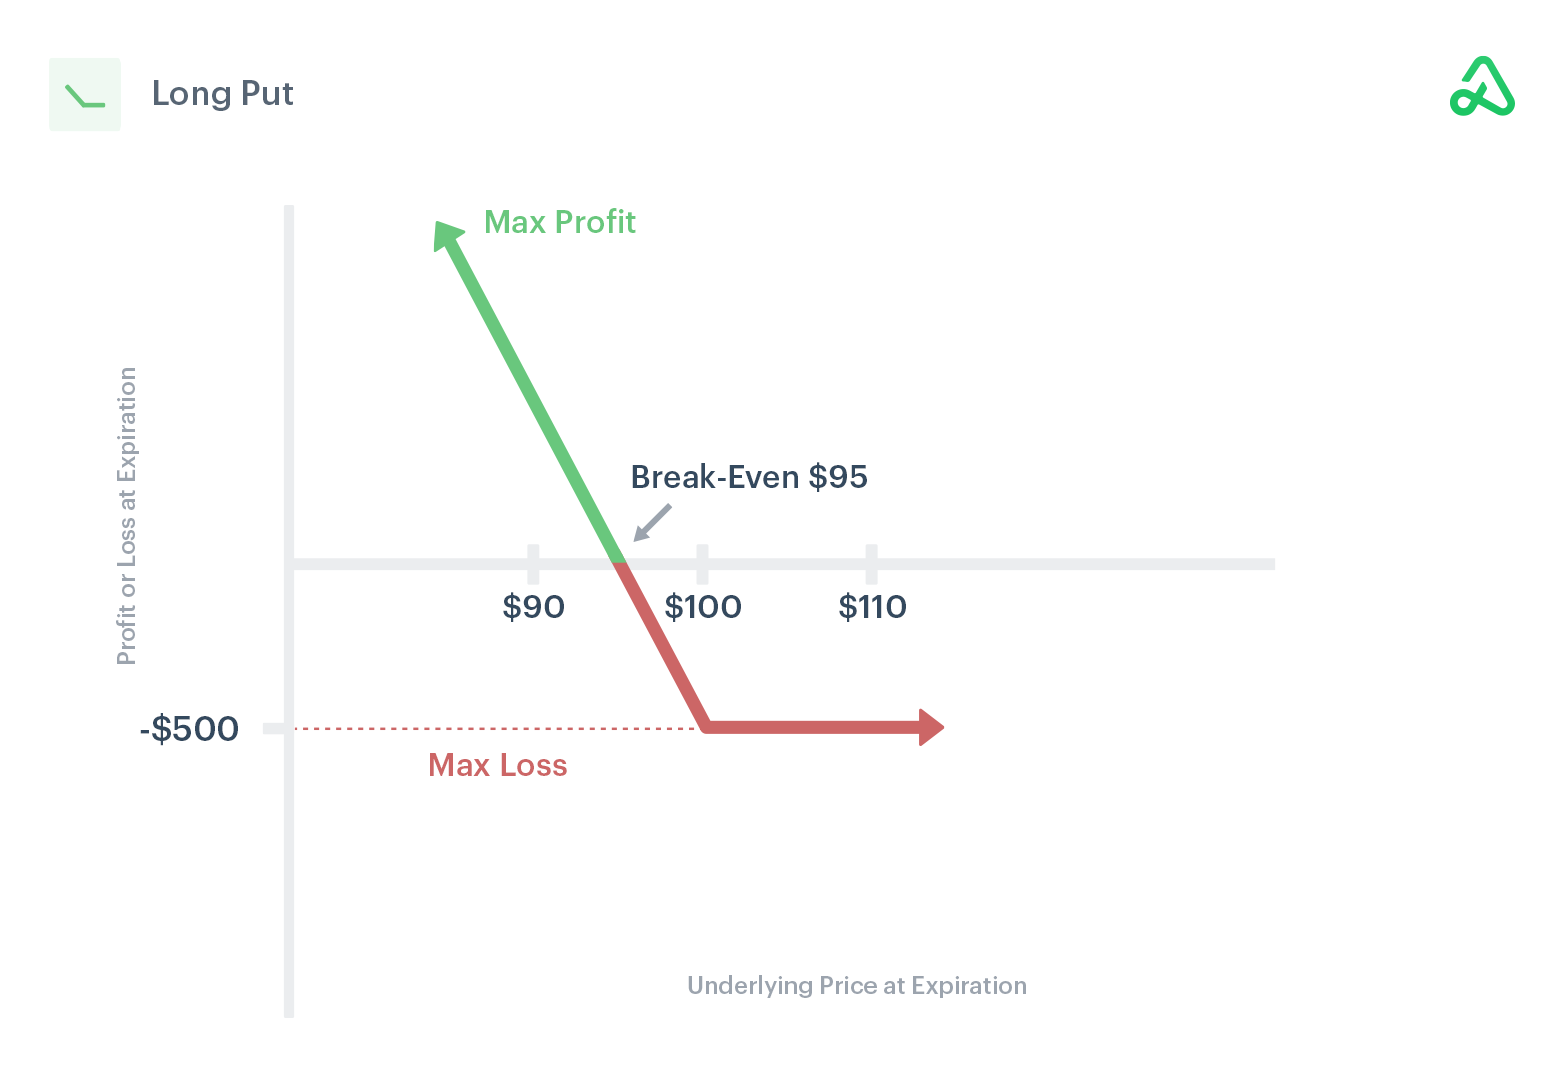 Long put payoff diagram